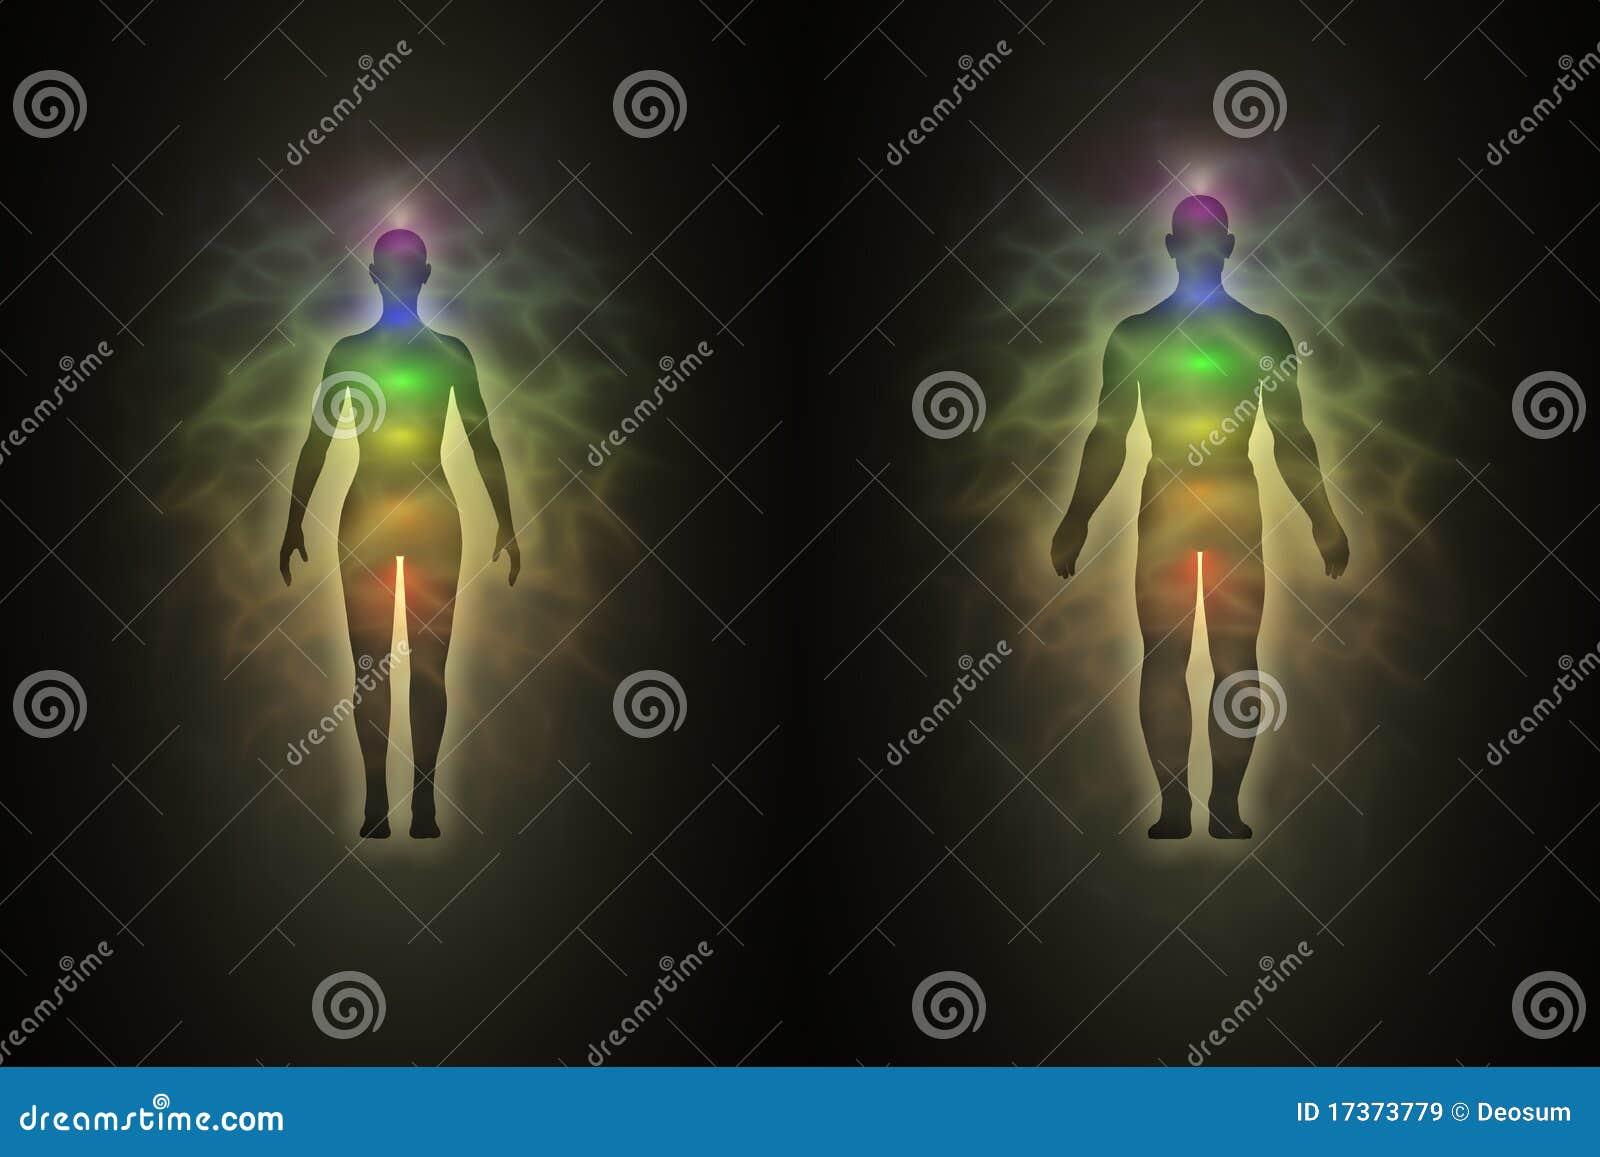 Woman Man Silhouette Aura Chakras Energy on Illustration Of Body And Spirit Soul